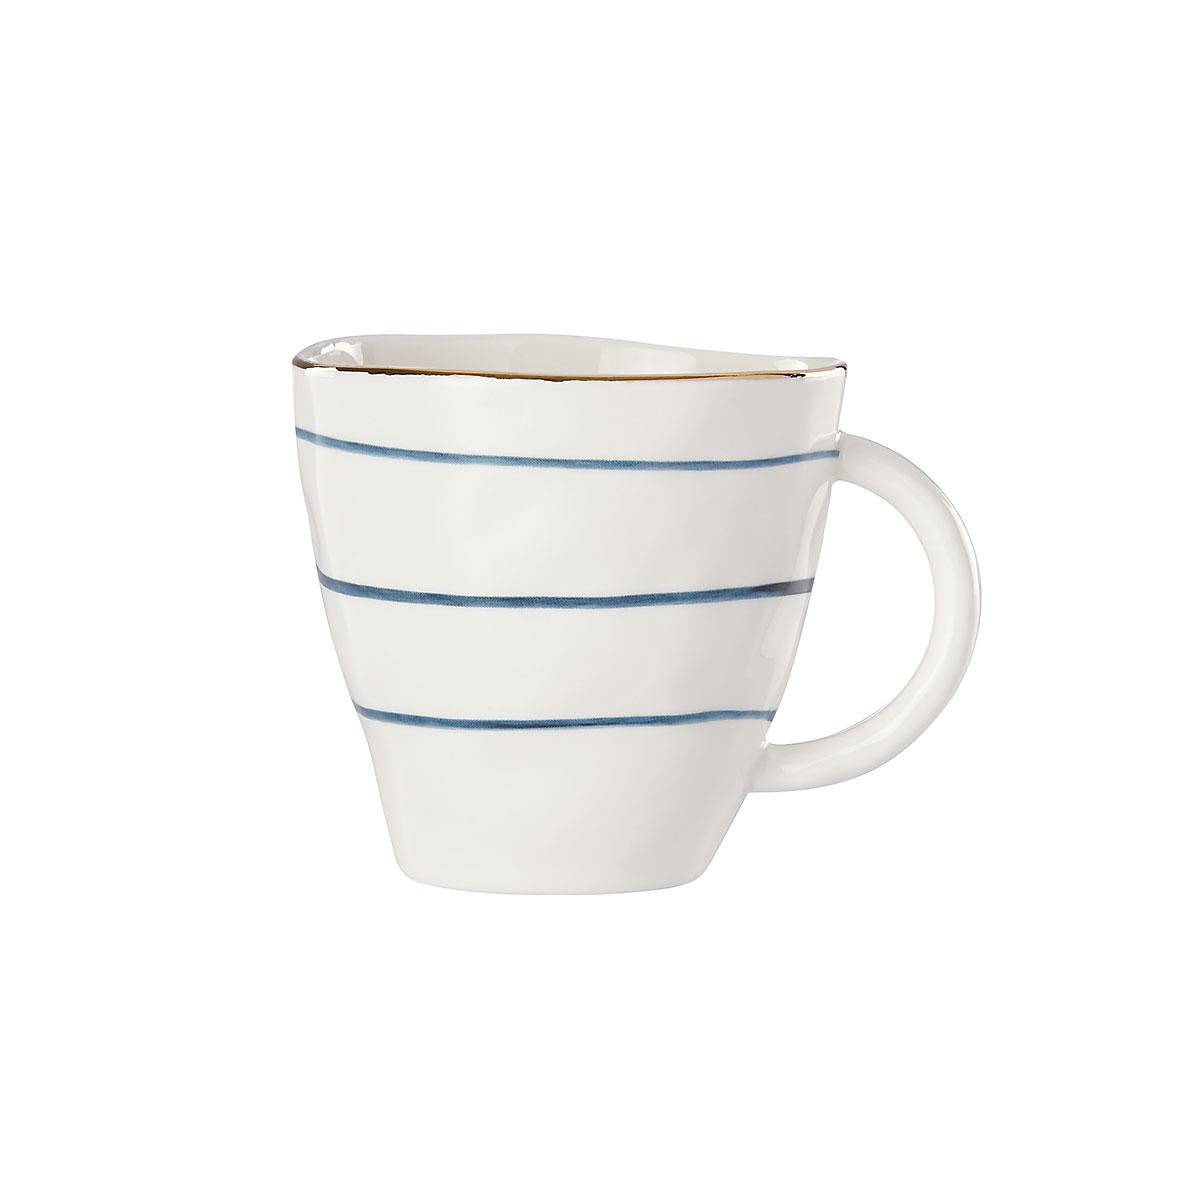 Lenox Blue Bay Stripe Dinnerware Dessert Mug